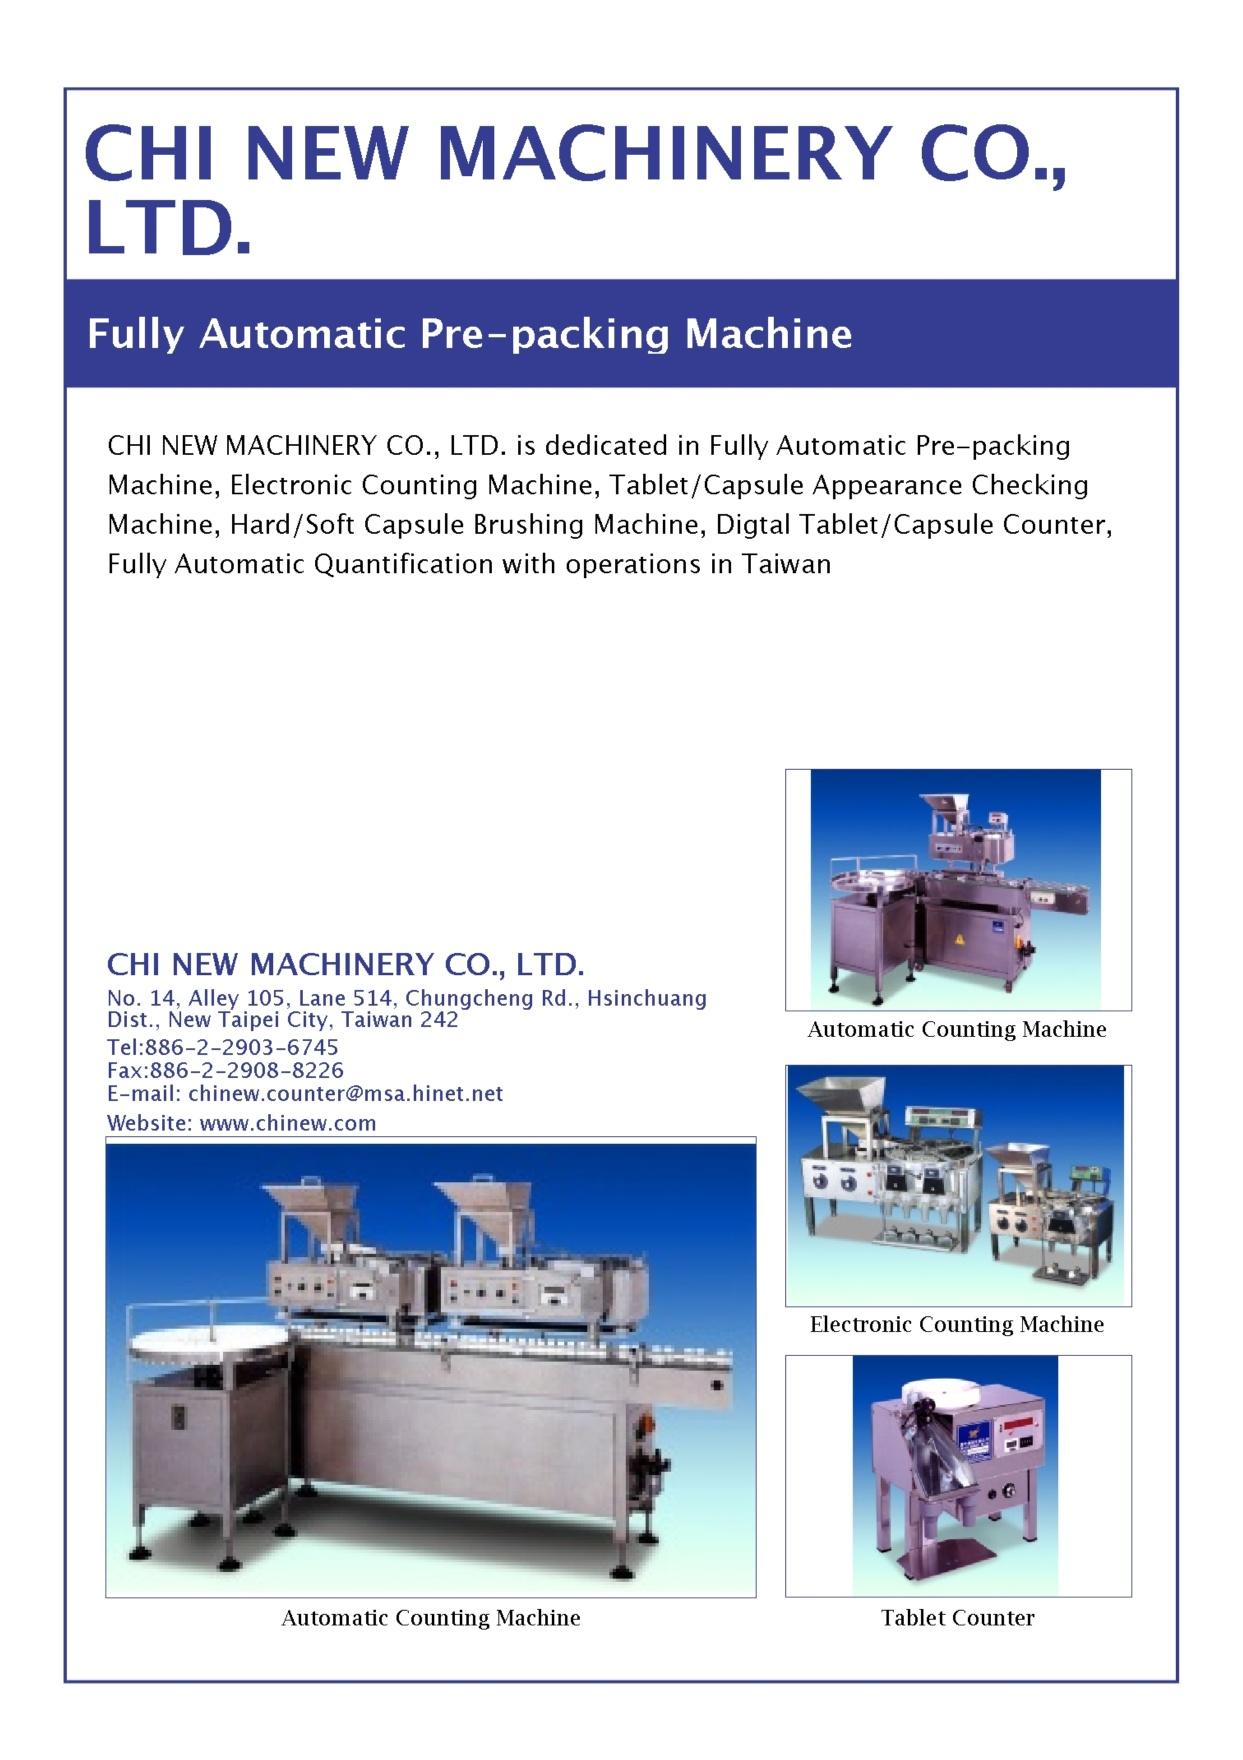 CHI NEW MACHINERY CO., LTD.